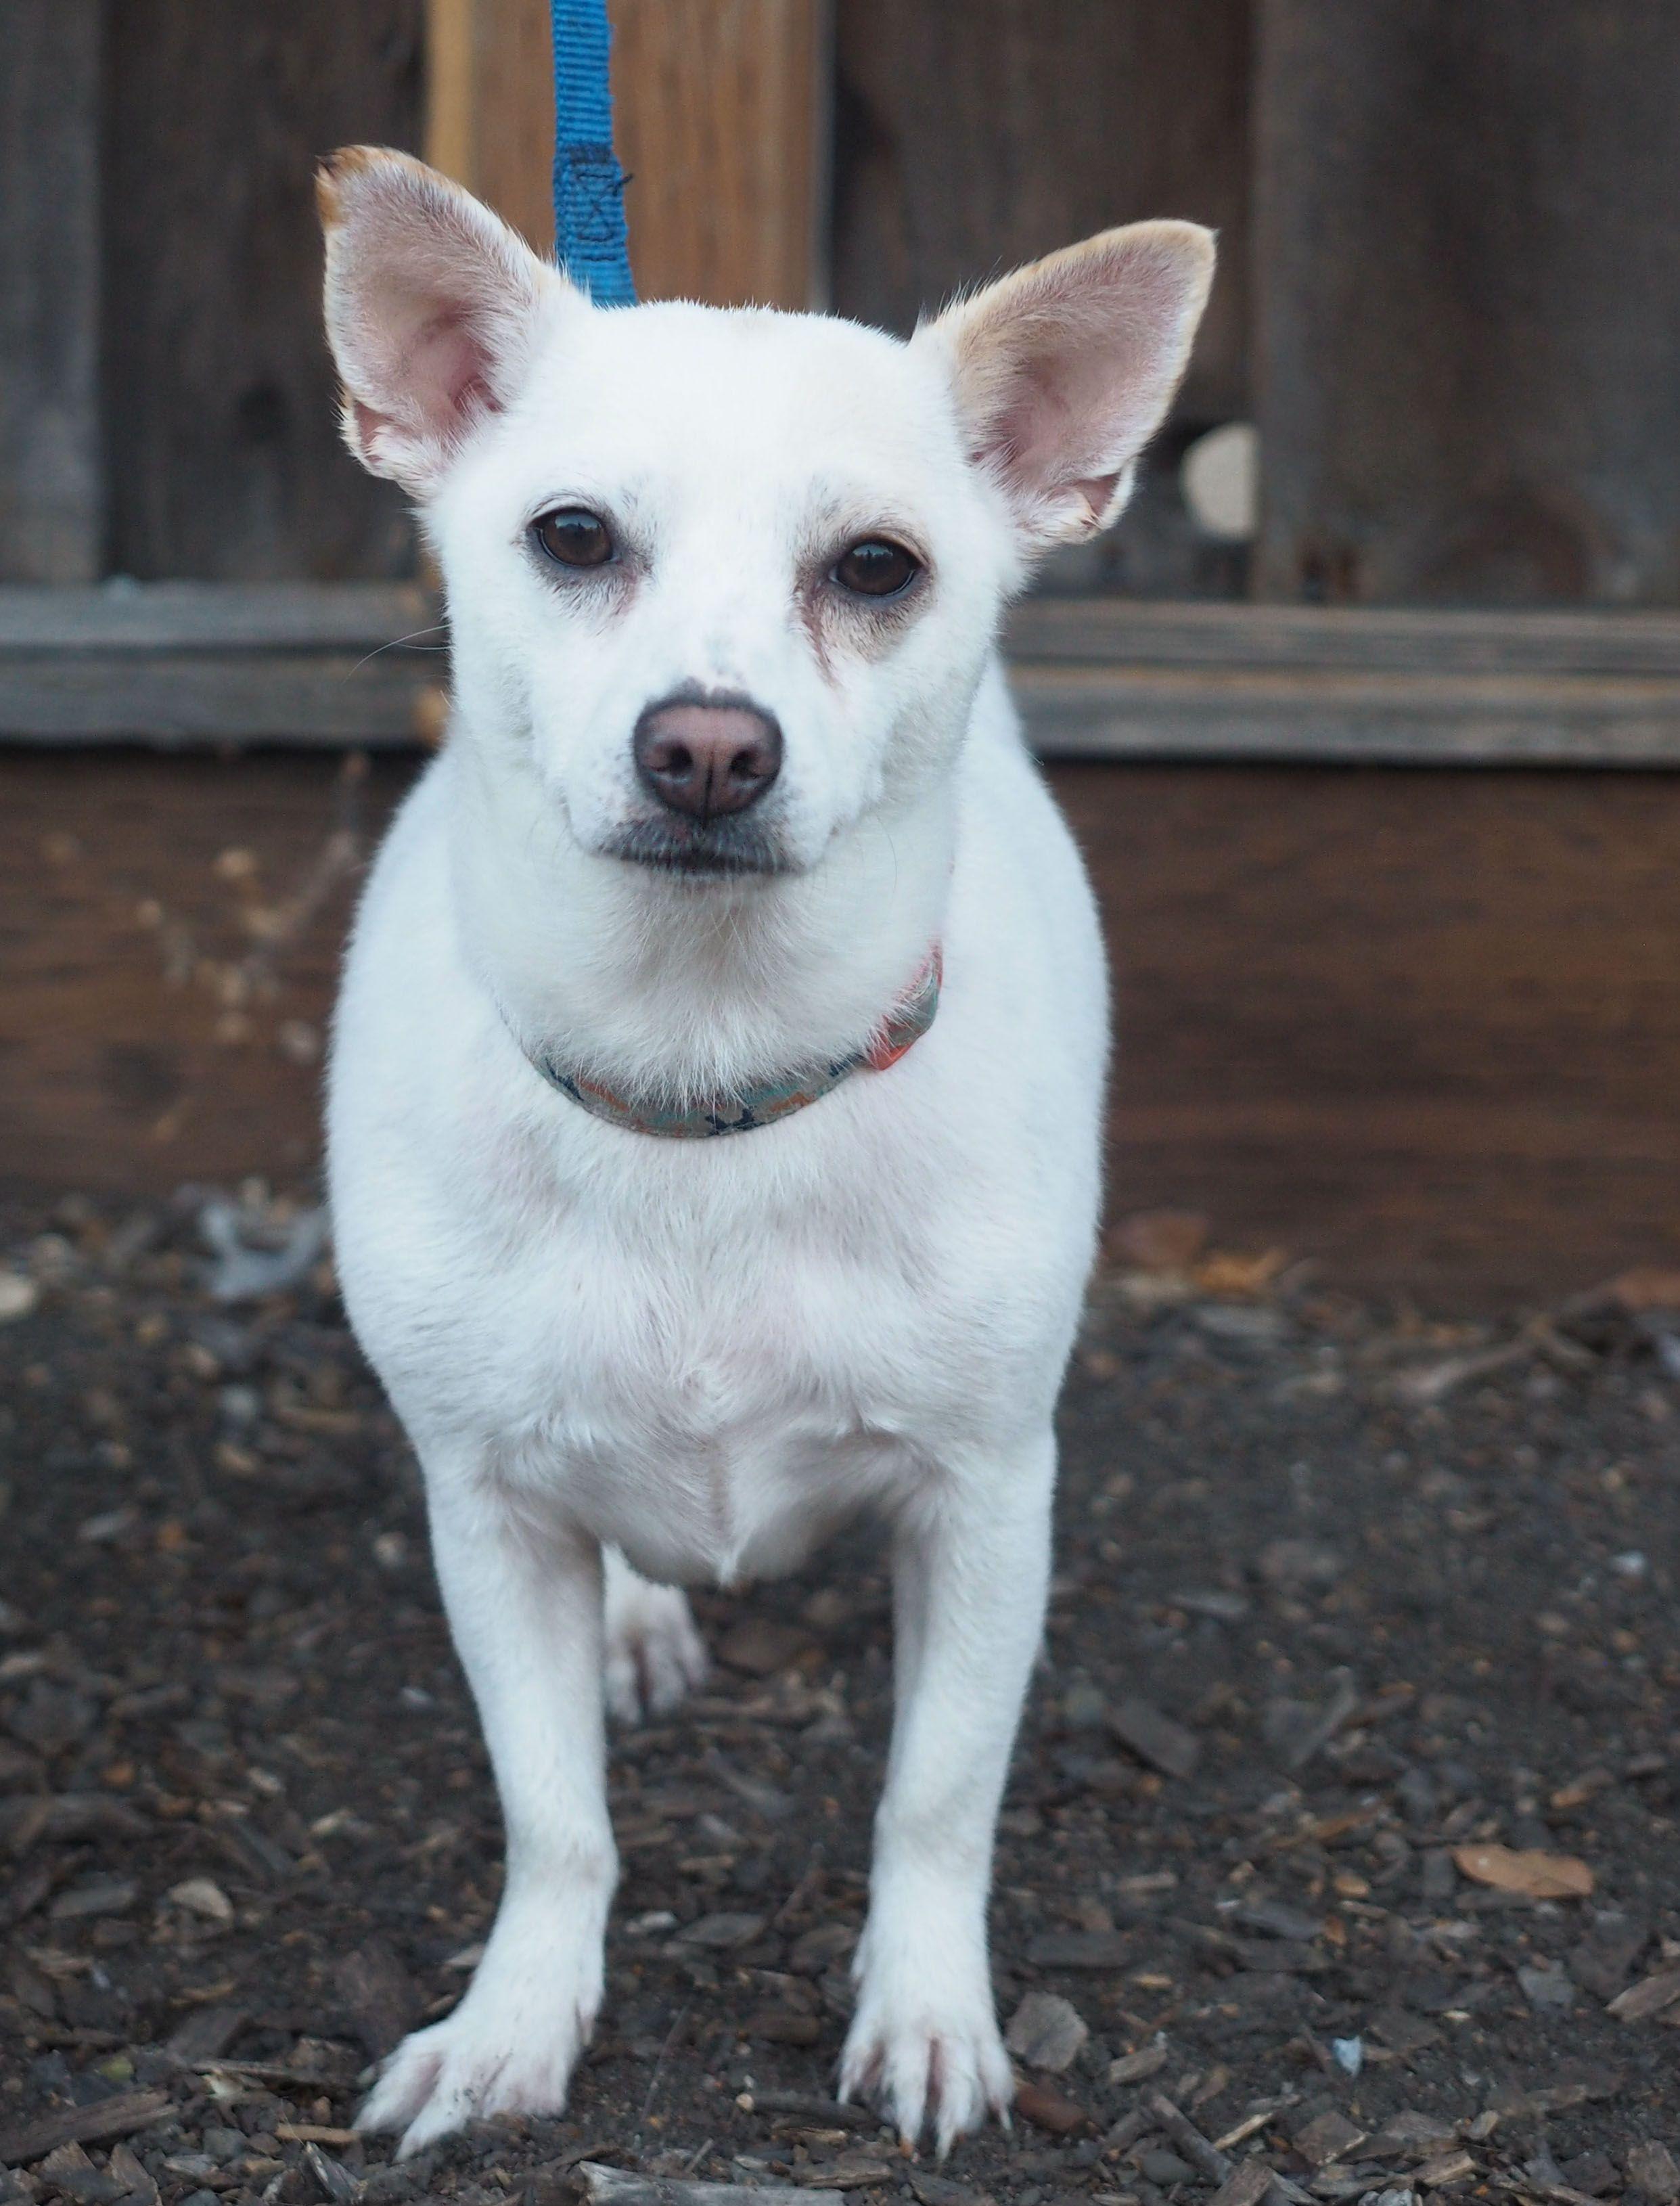 Dorgi Dog For Adoption In Palo Alto Ca Adn 698728 On Puppyfinder Com Gender Female Age Adult Dog Adoption Corgi Dachshund Dogs